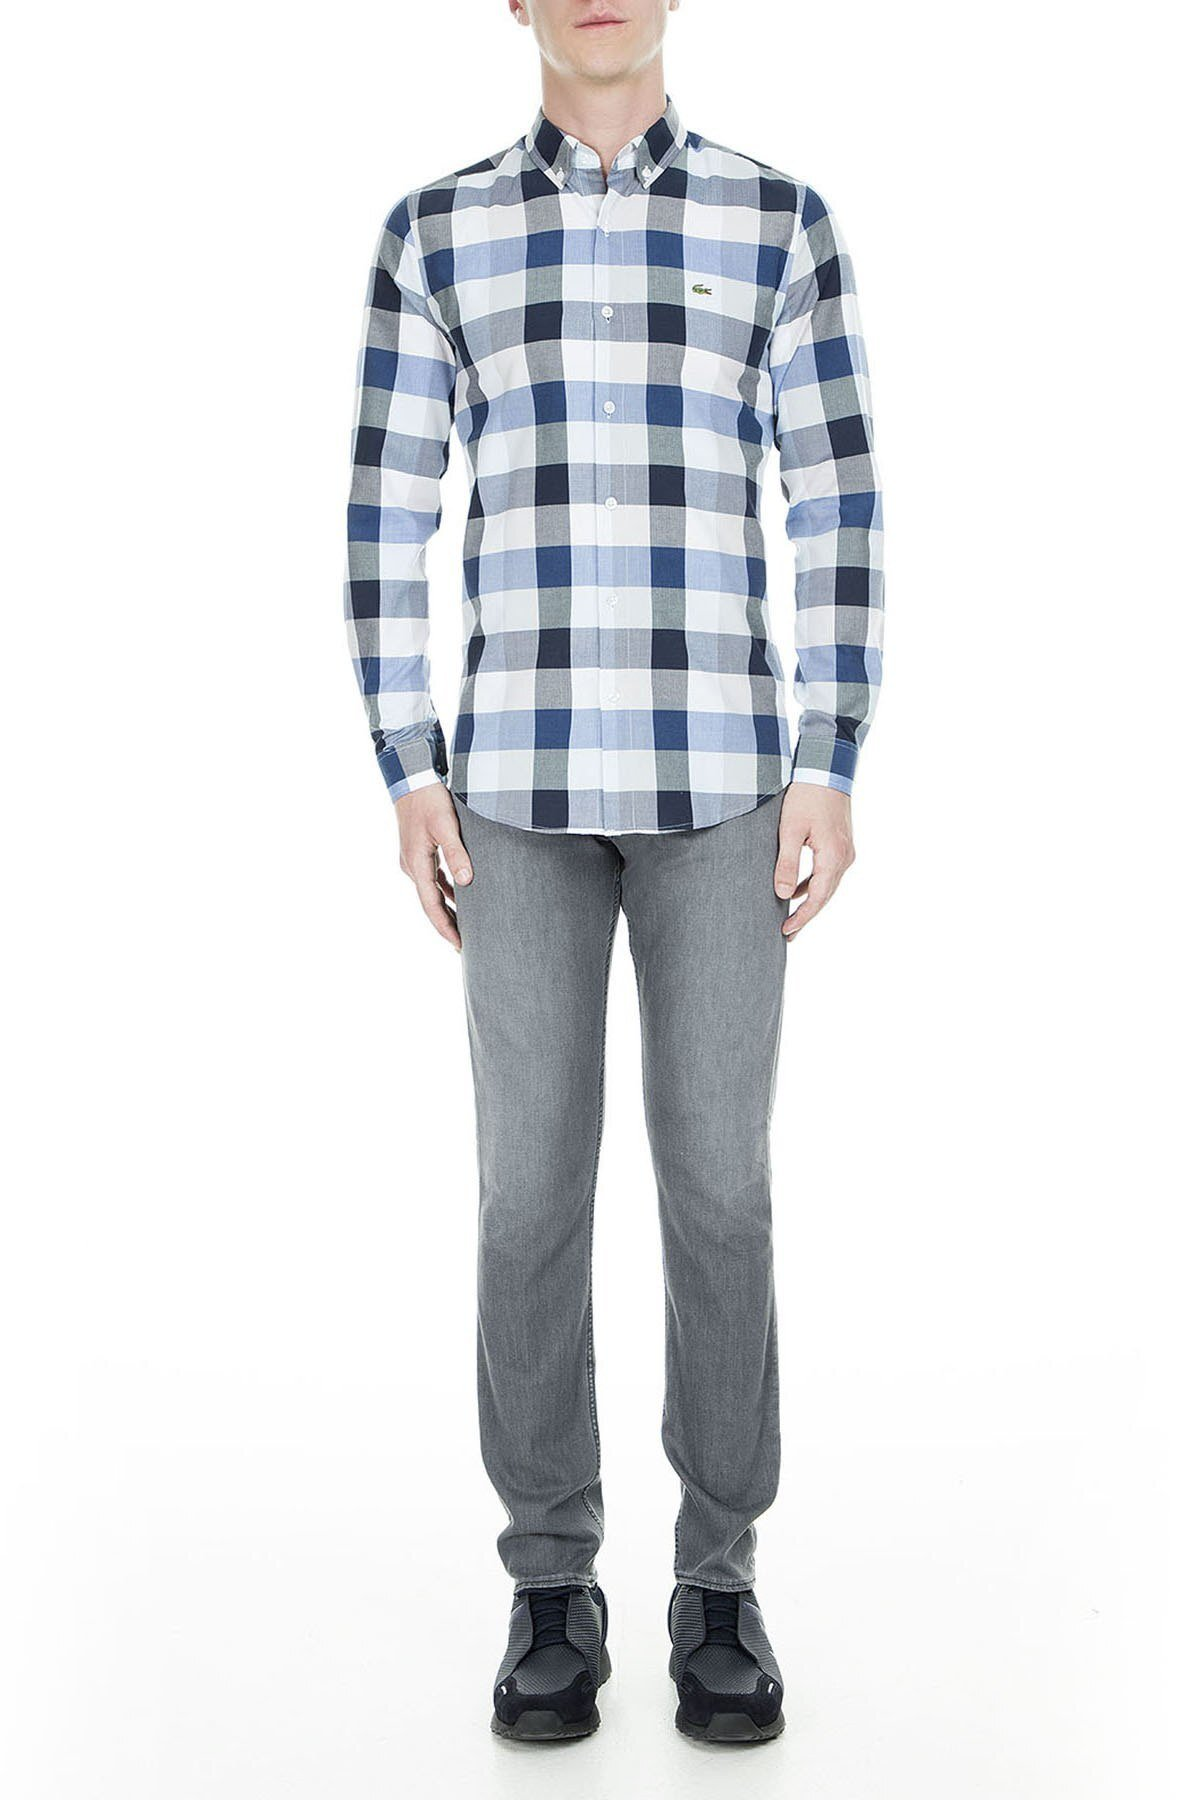 Lacoste Slim Fit Erkek Gömlek CH2015 15S GRİ-MAVİ